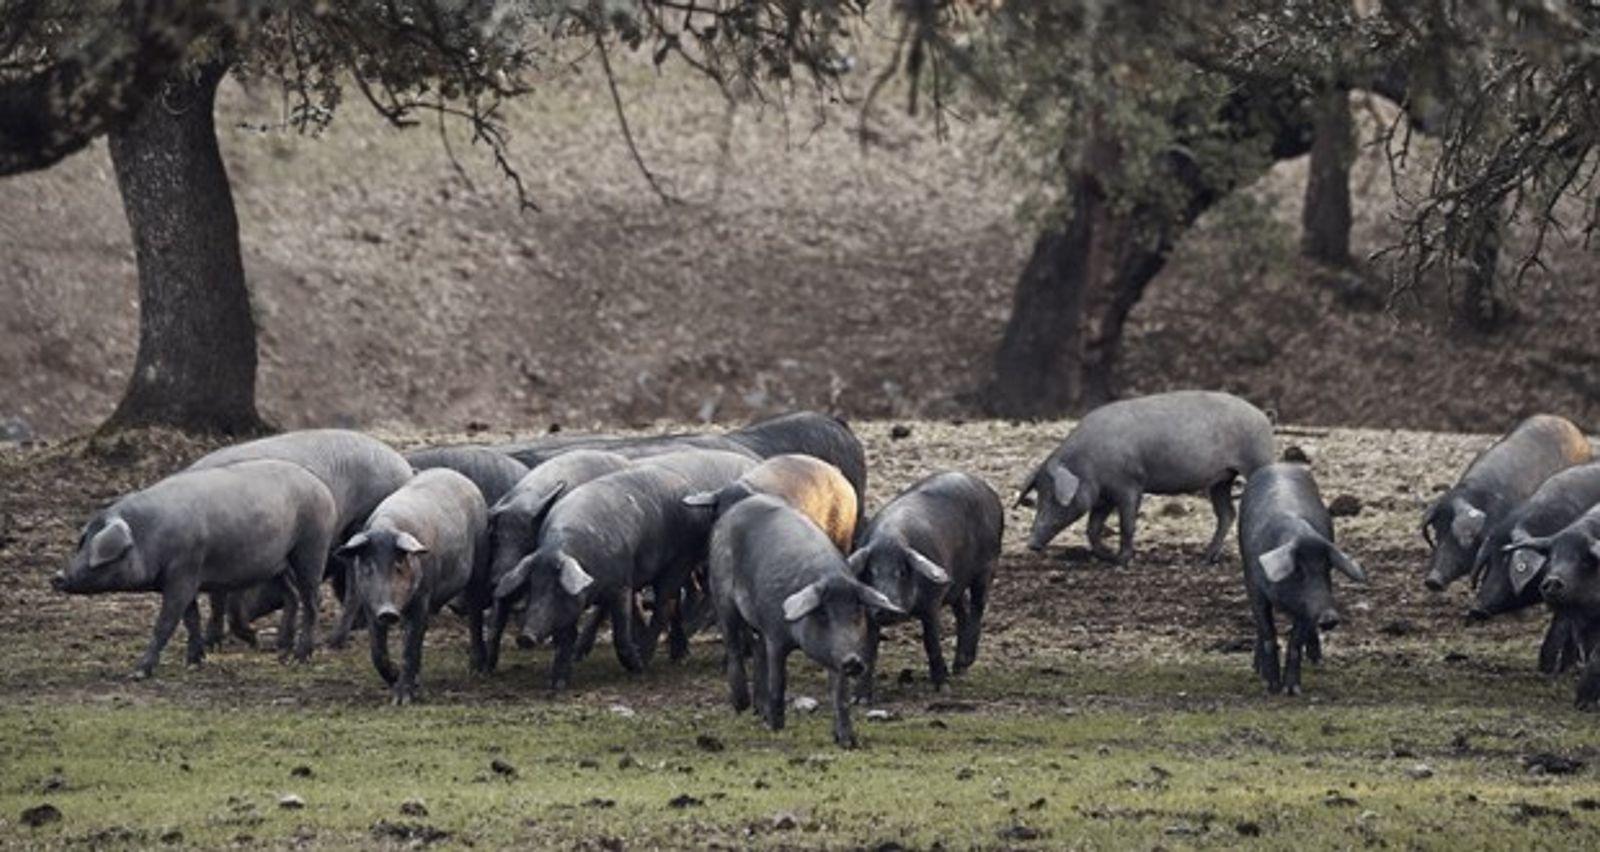 Black Iberian pigs